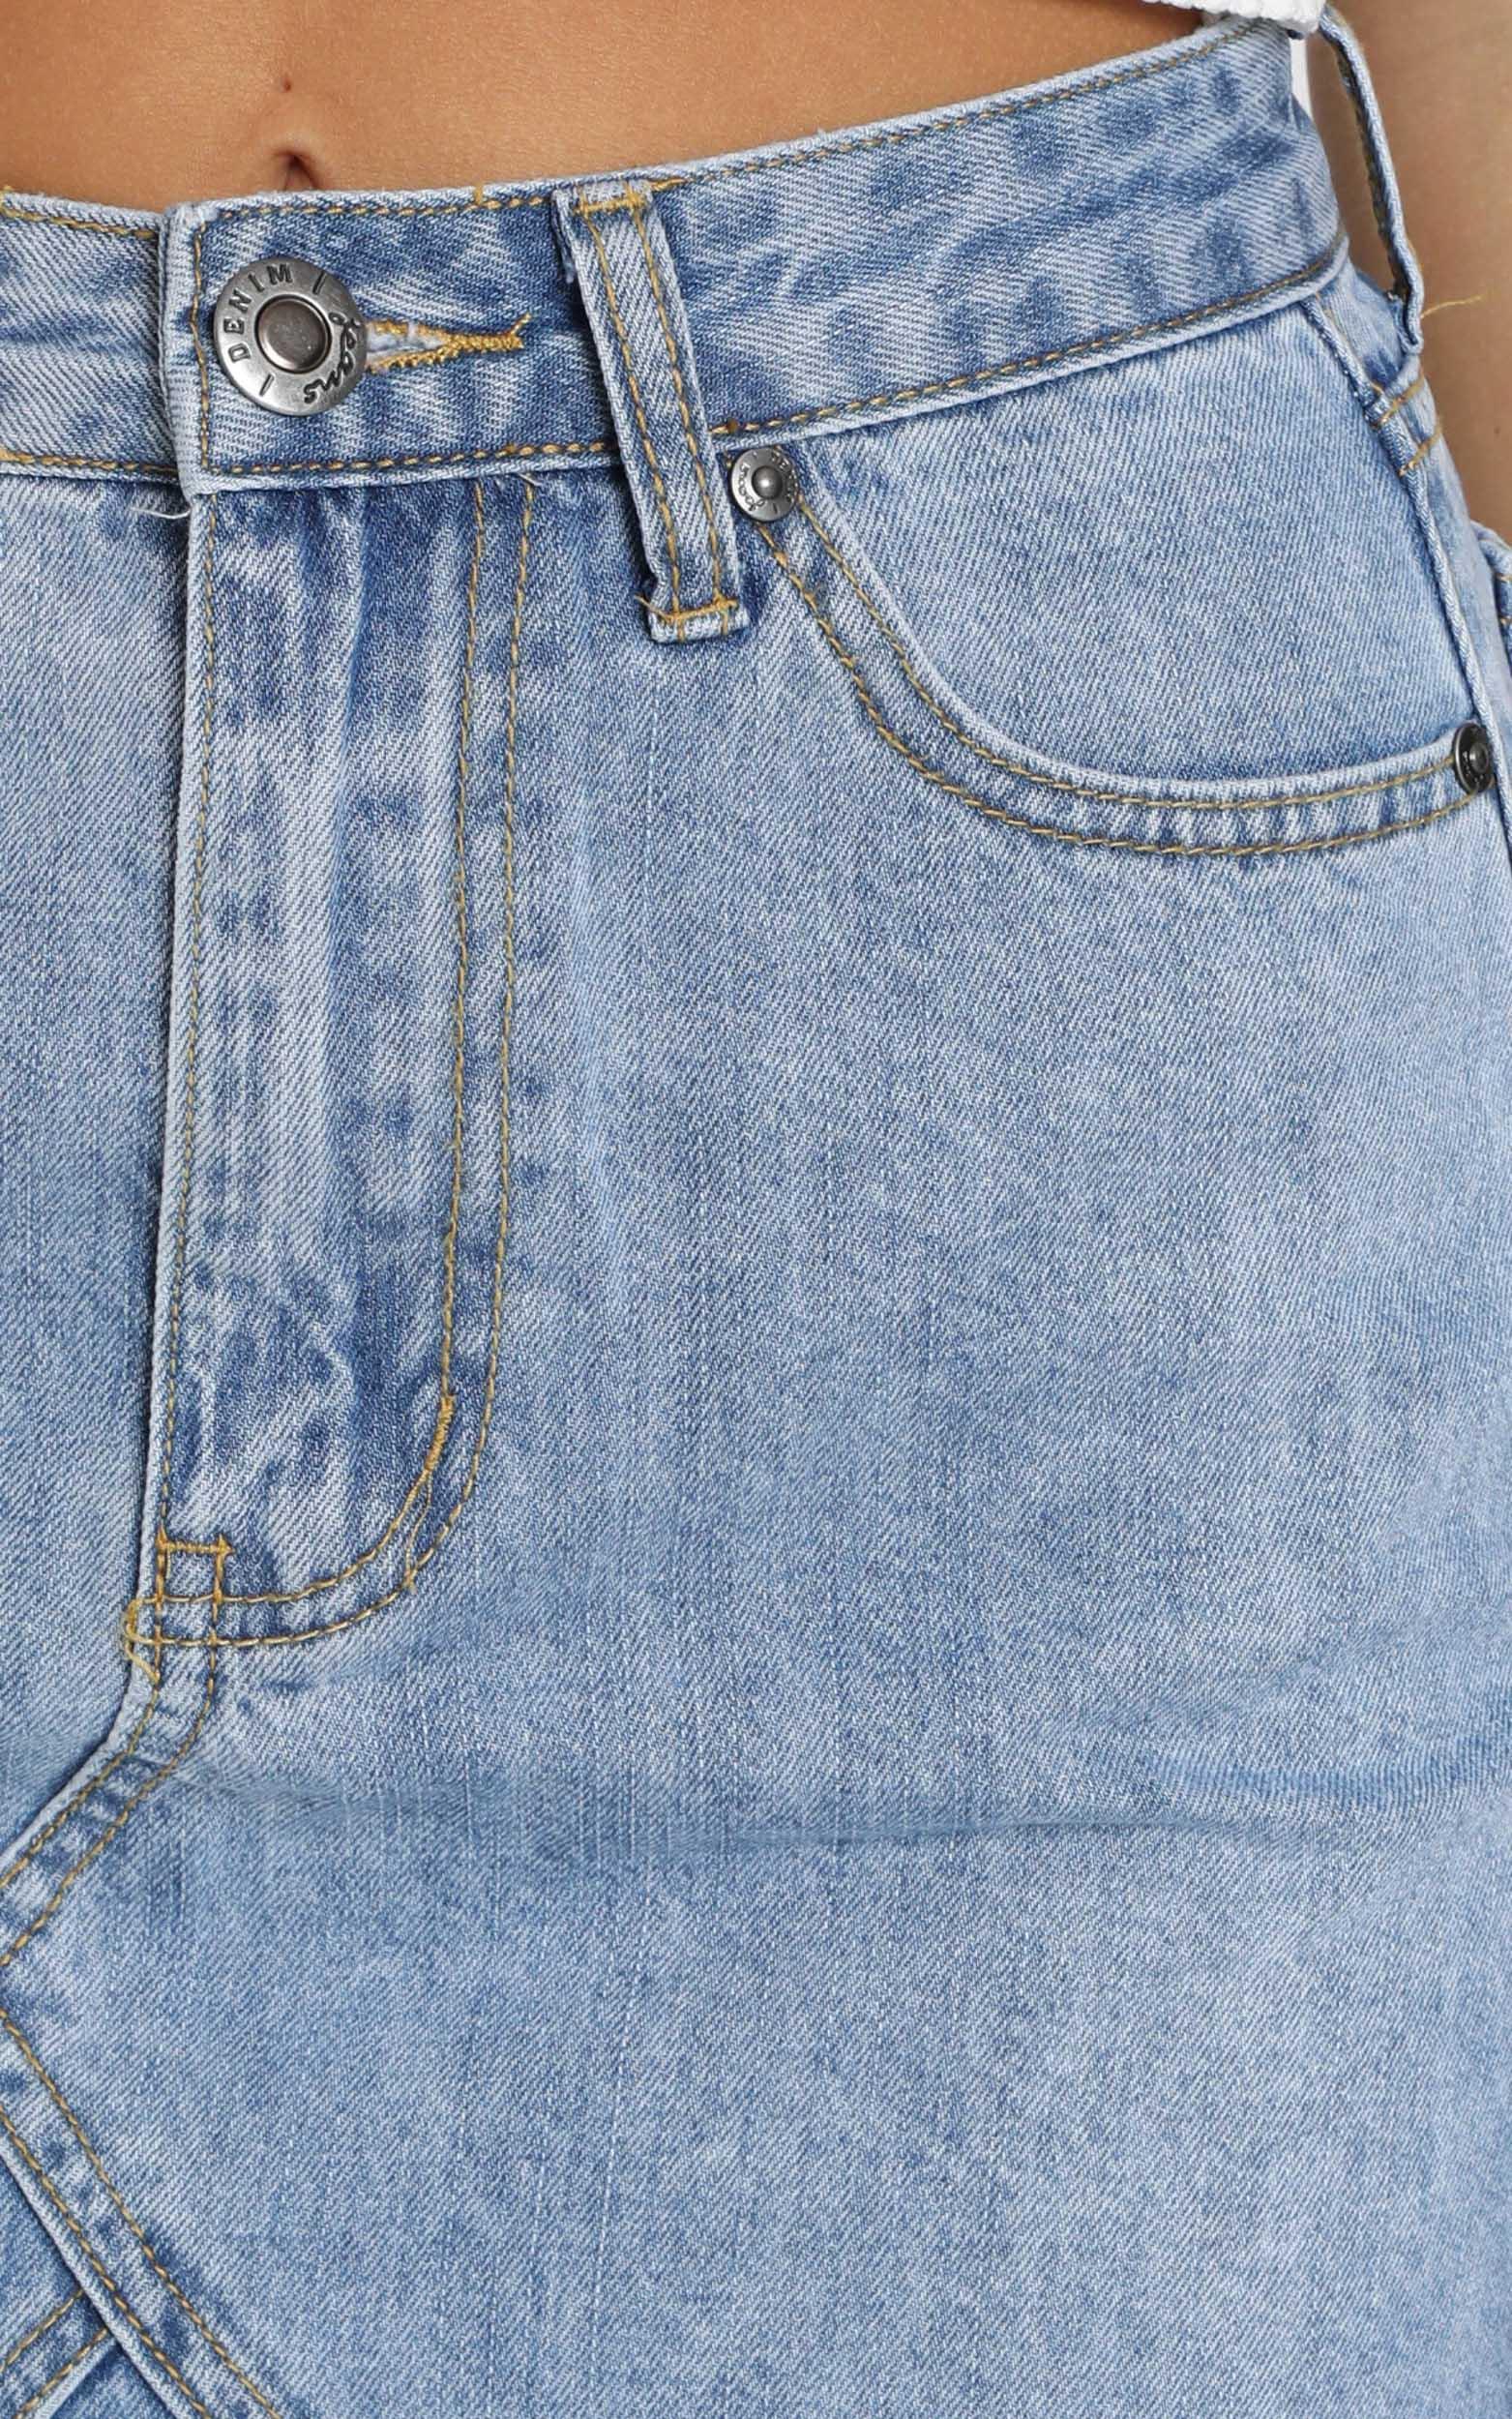 Aubree Denim Skirt In Mid Wash - 20 (XXXXL), Blue, hi-res image number null